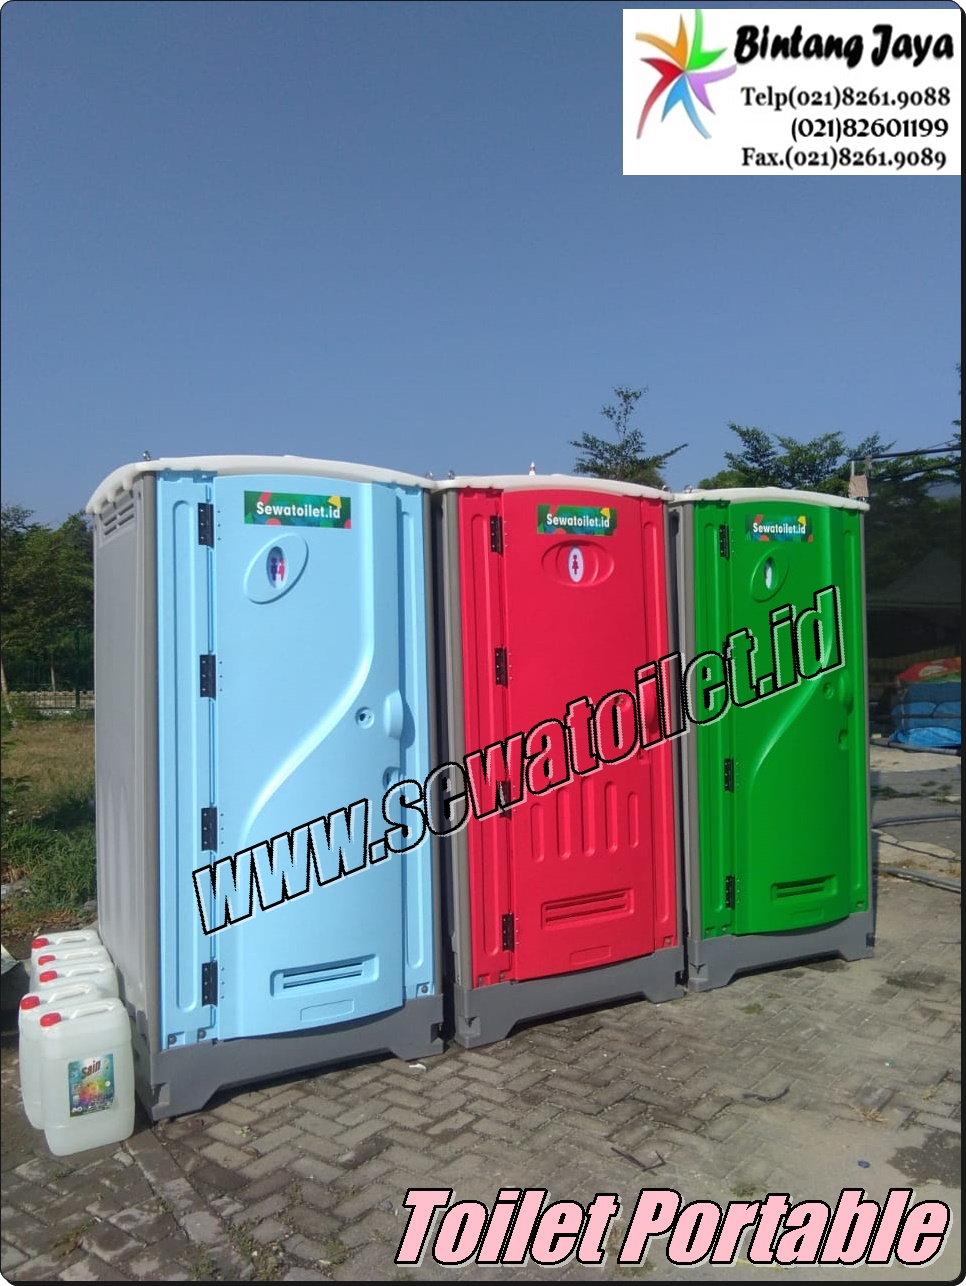 Sewa Toilet Portable Gambir Jakarta Pusat